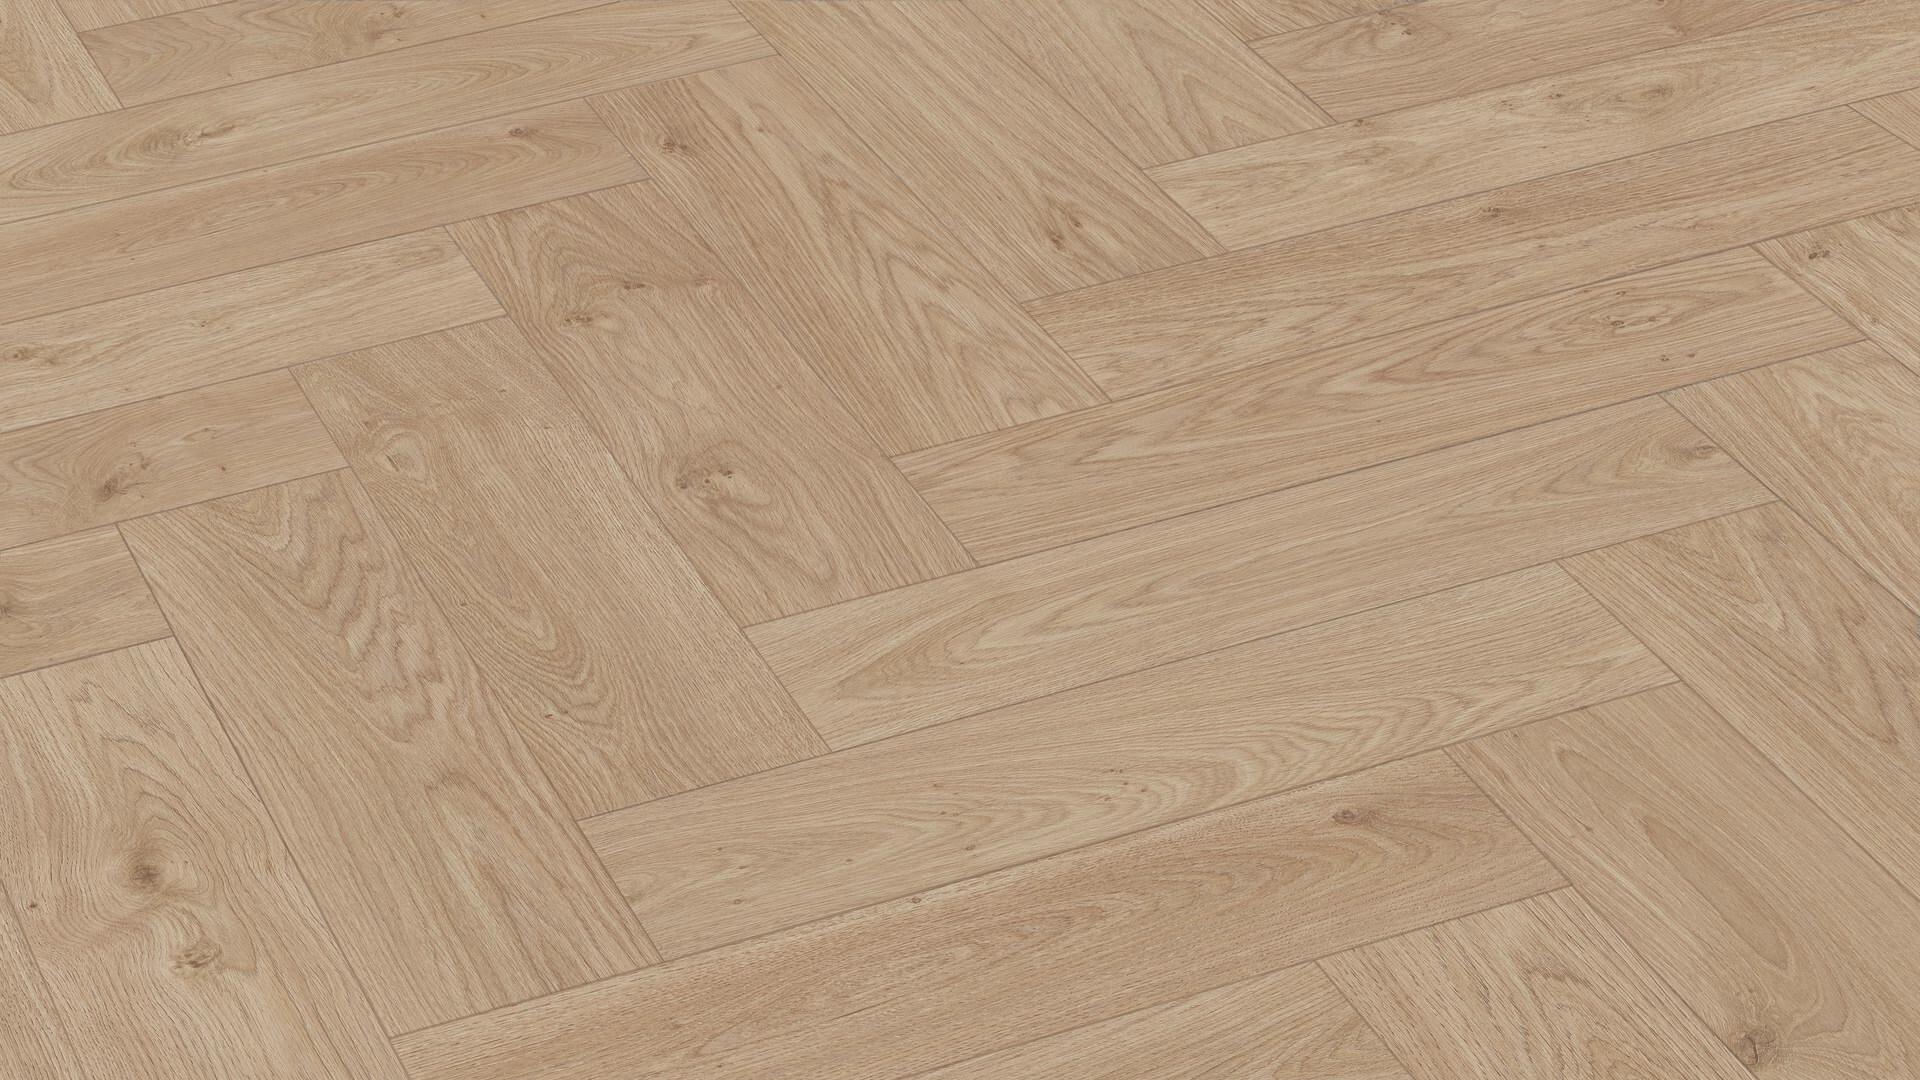 Laminate flooring MeisterDesign. laminate Edition M6 Pure relax oak 6863